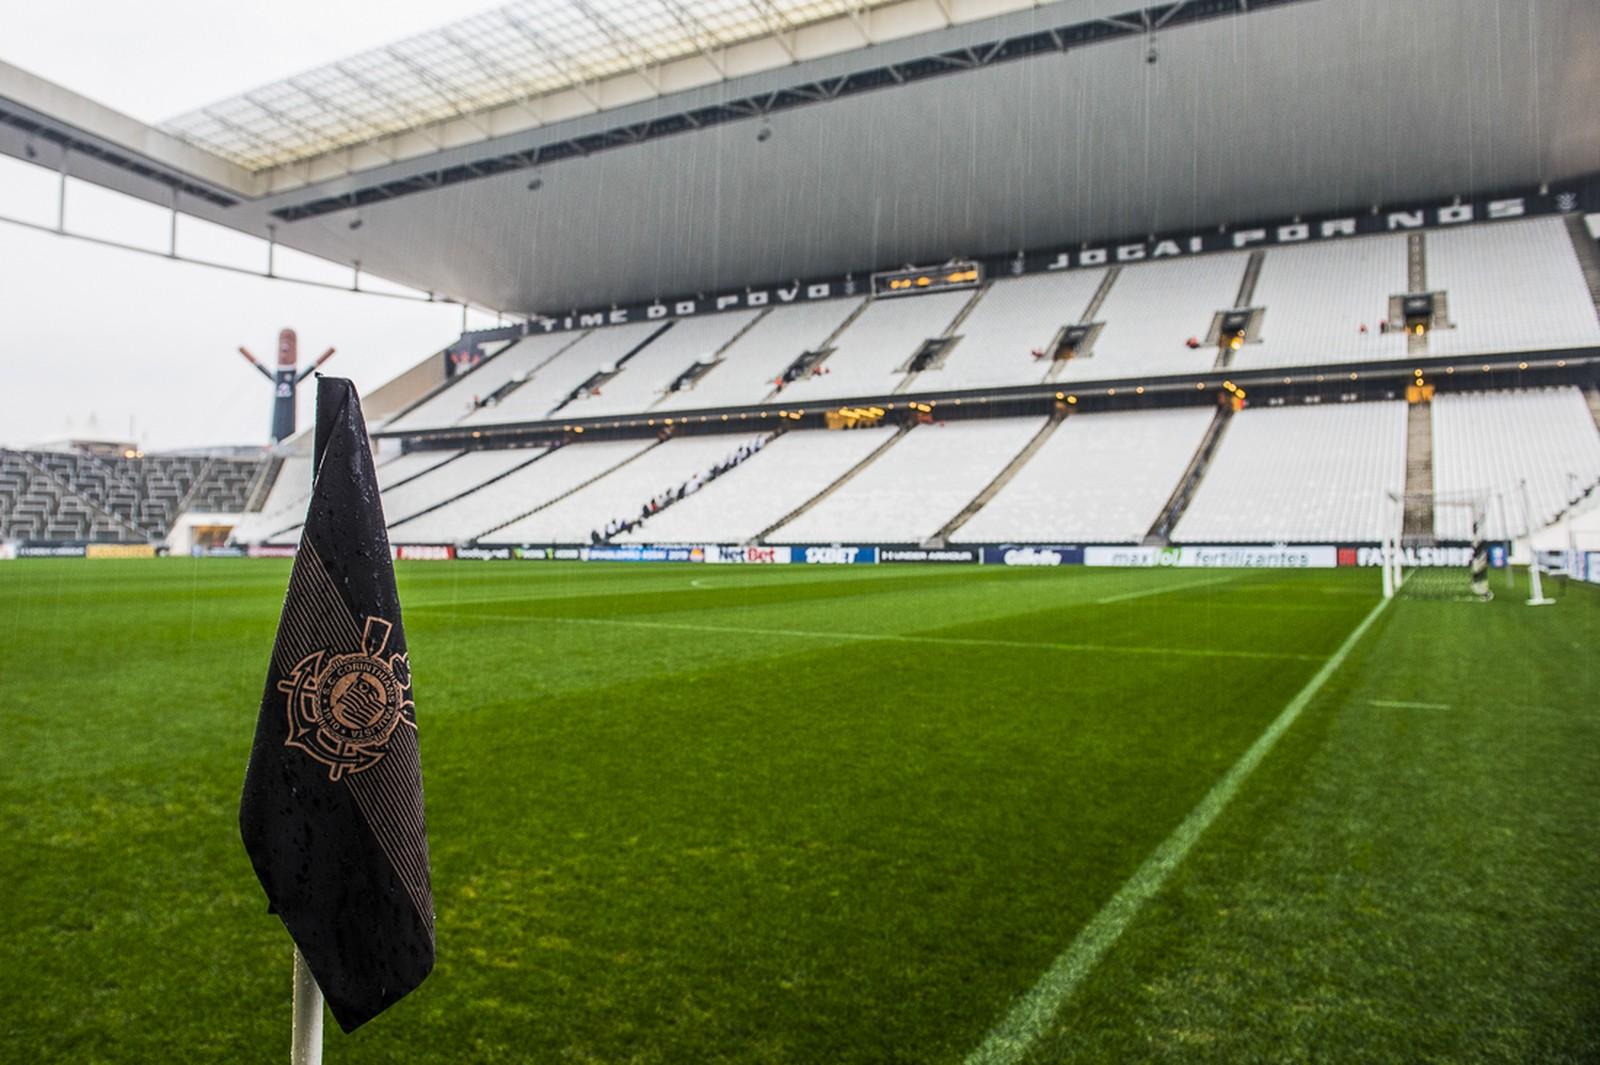 Caixa Econômica Federal avisa que executará dívida da Arena Corinthians; confira o valor